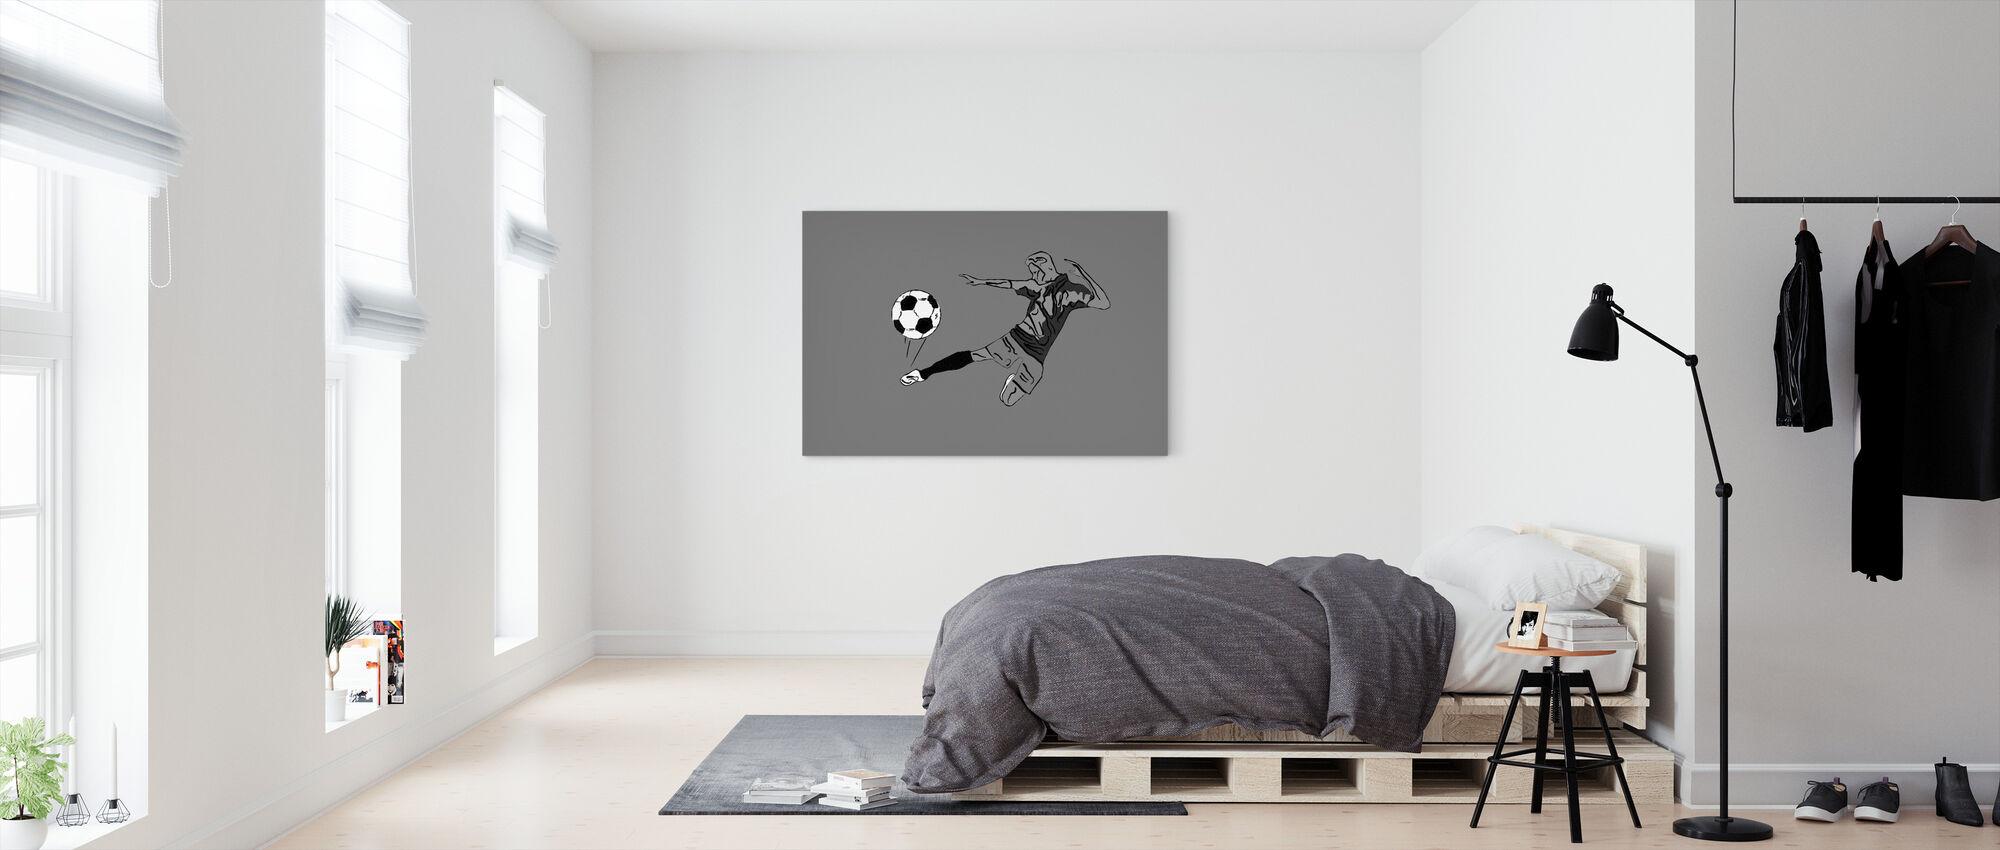 Kick It - Grau - Leinwandbild - Schlafzimmer